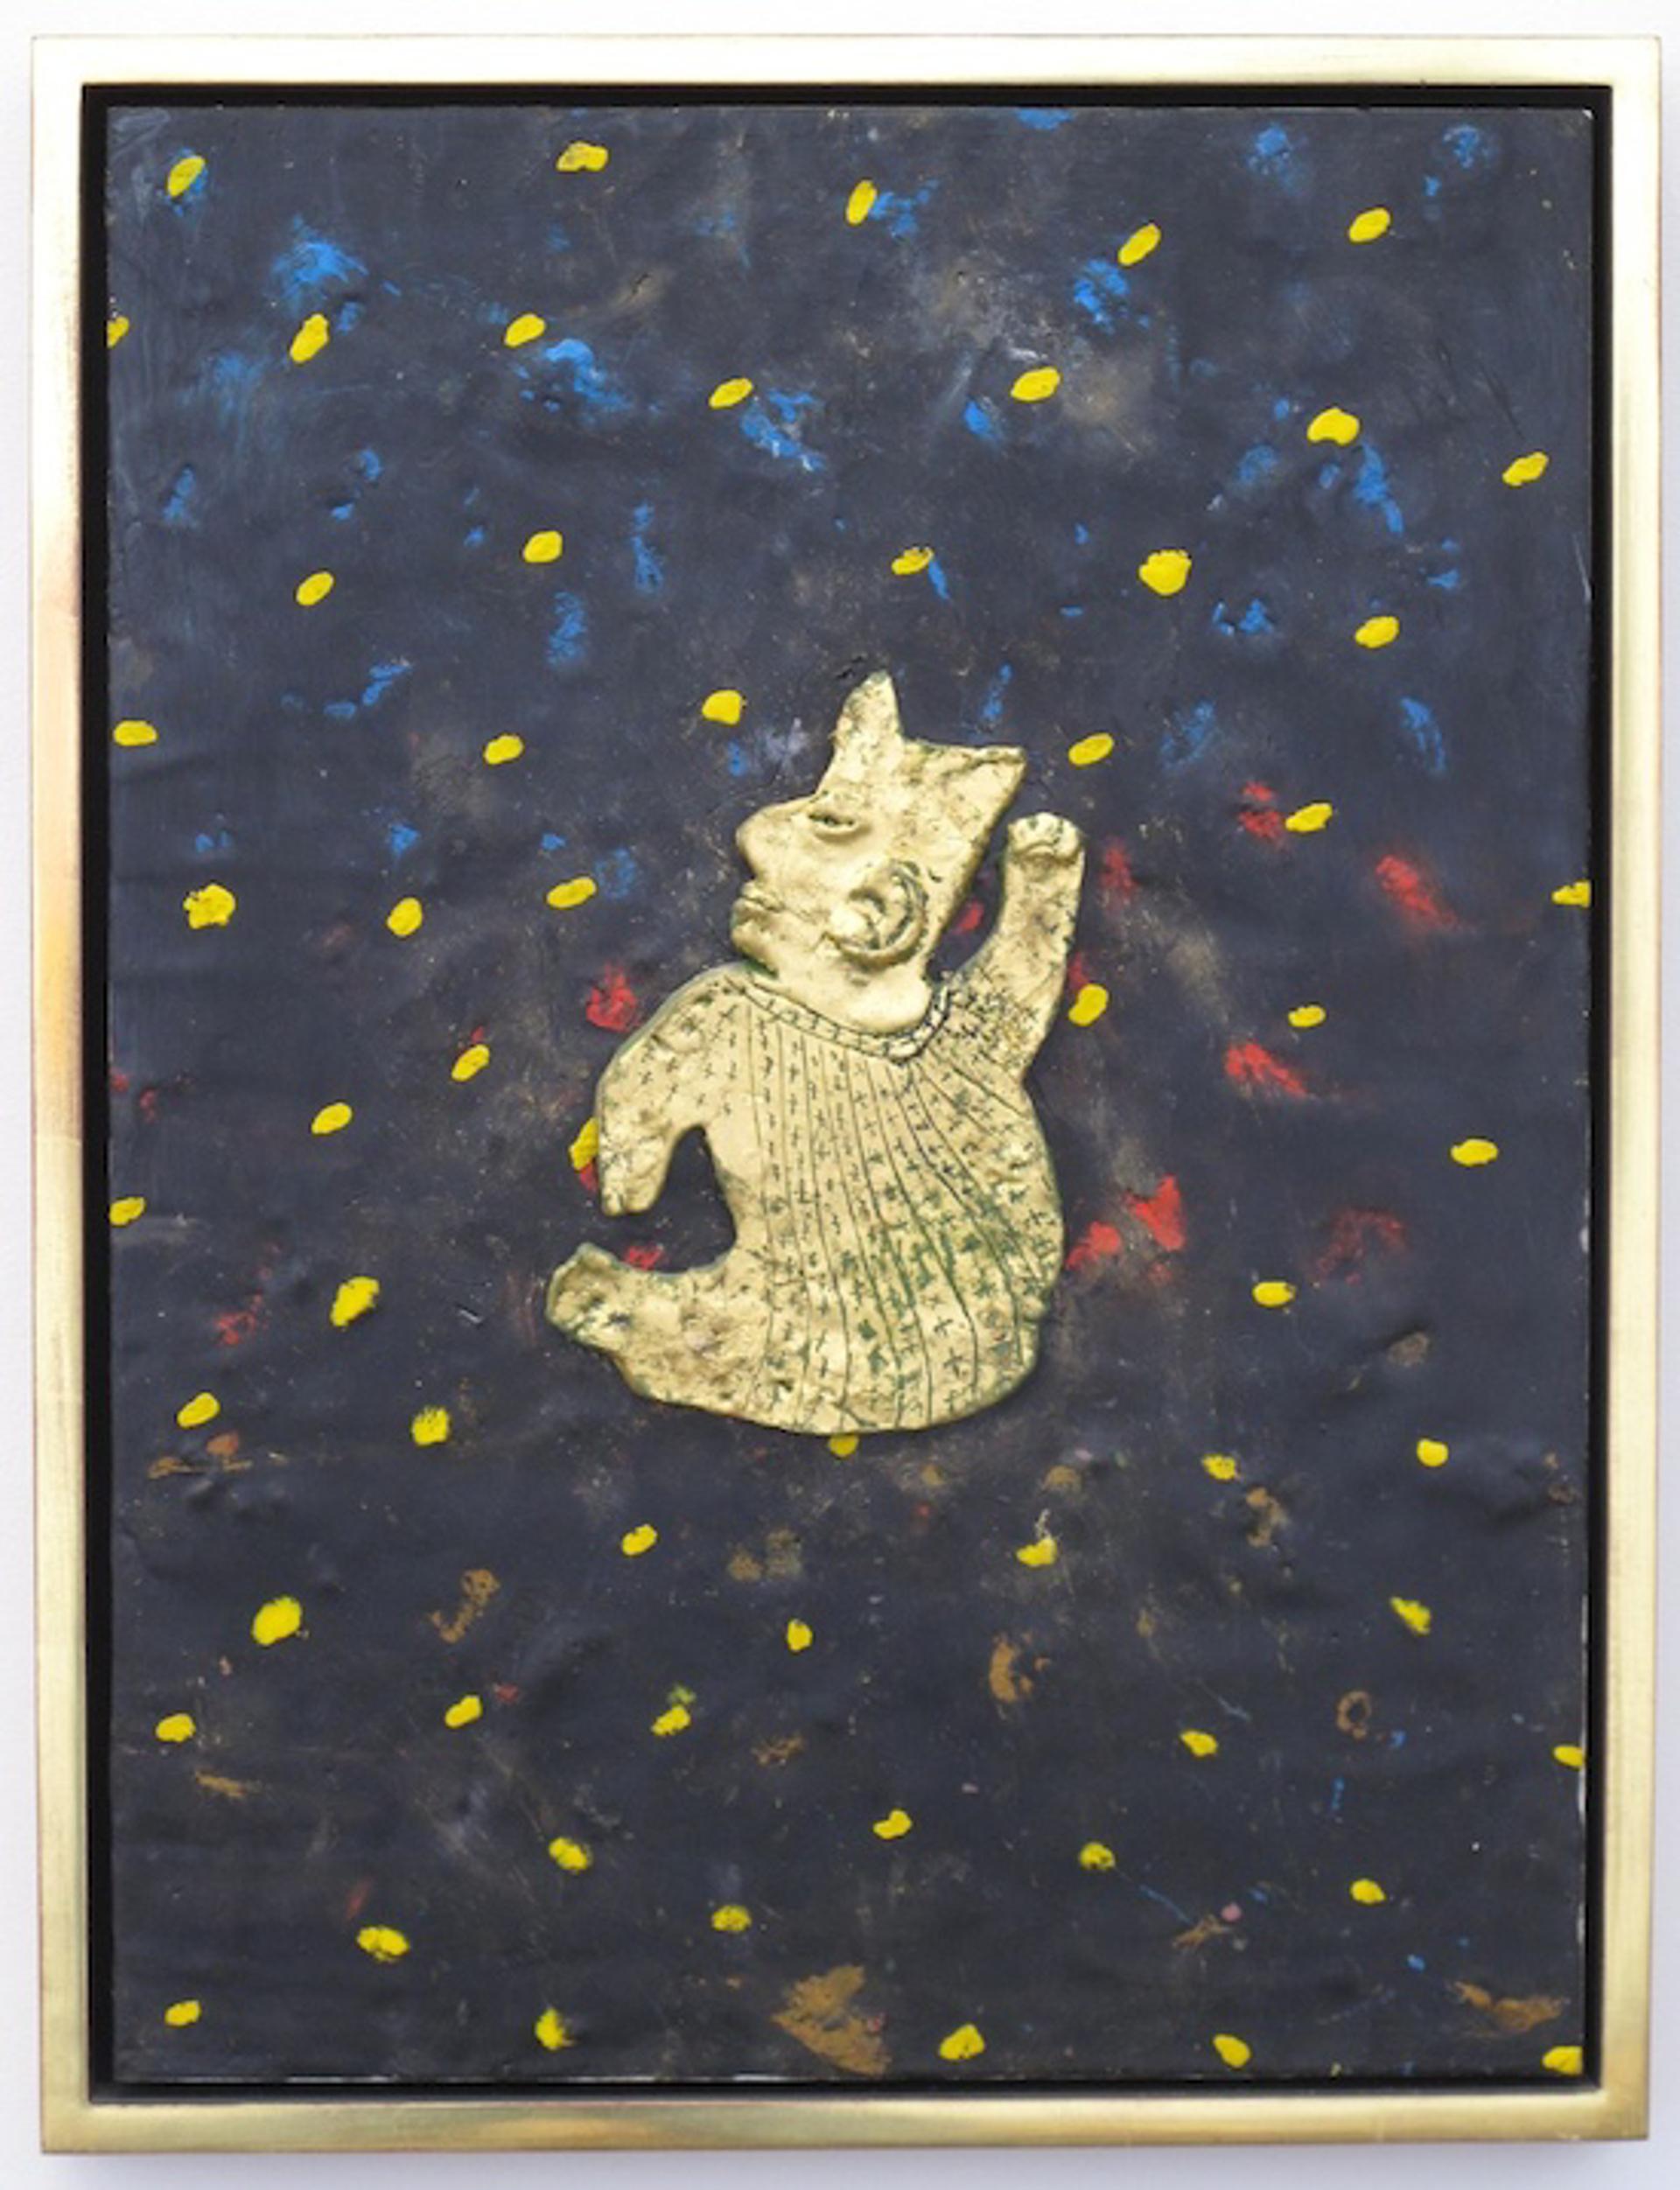 Gold Artifact with Dark Blue Night Sky by James Havard